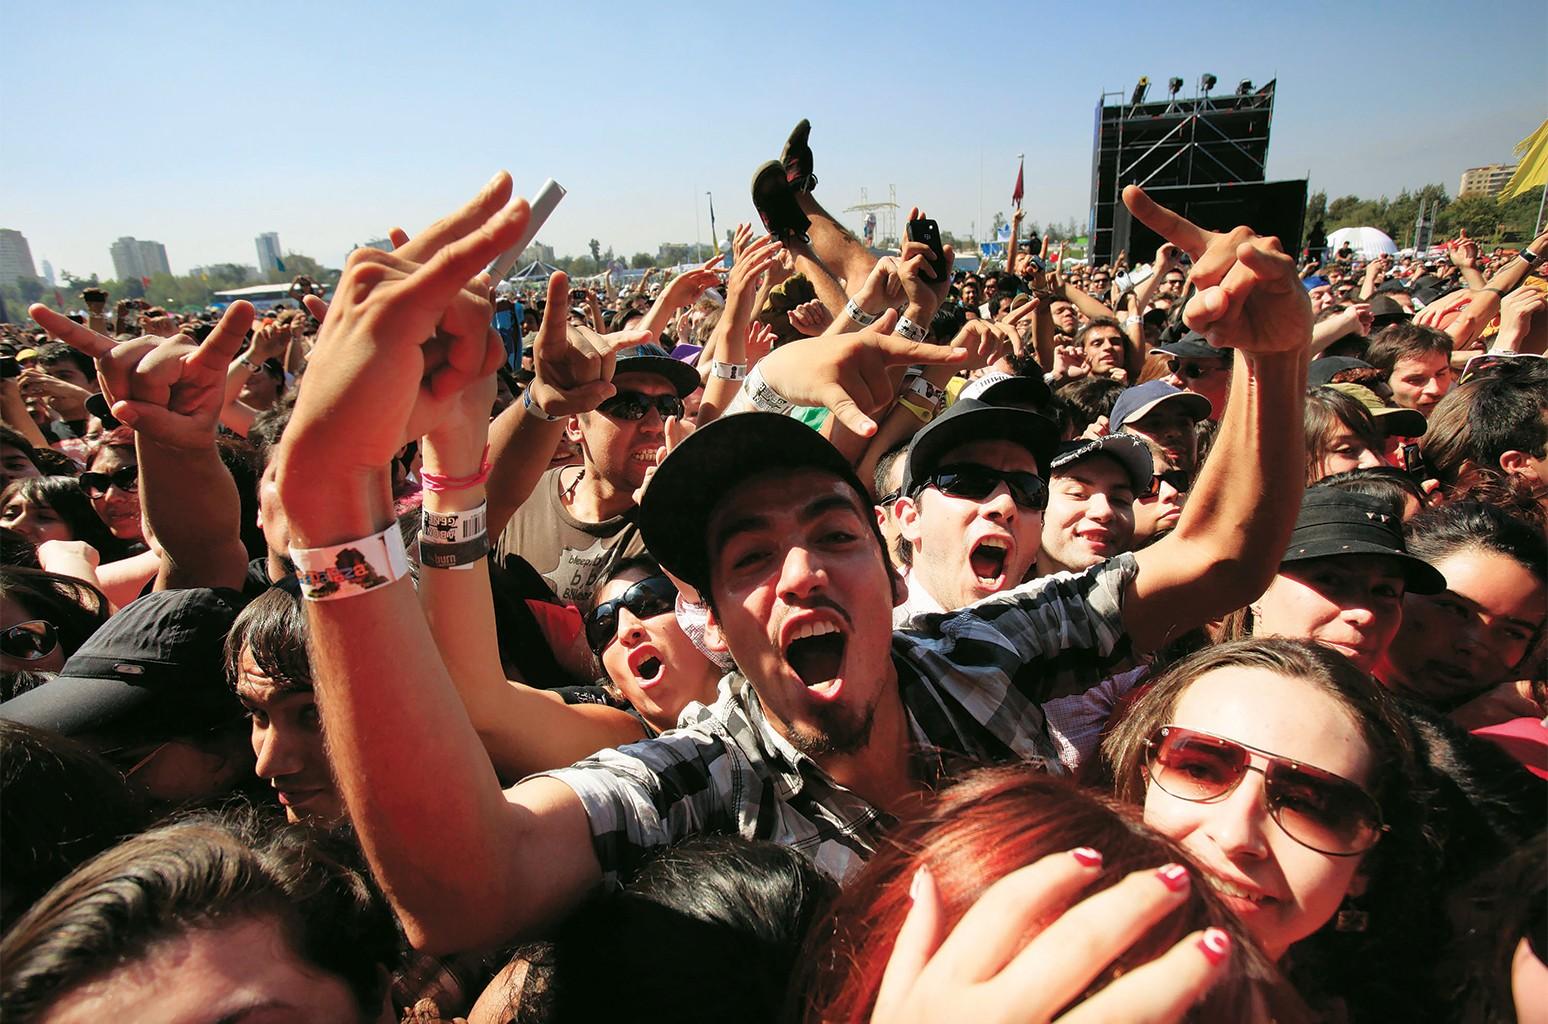 2011 Lollapalooza Music Festival